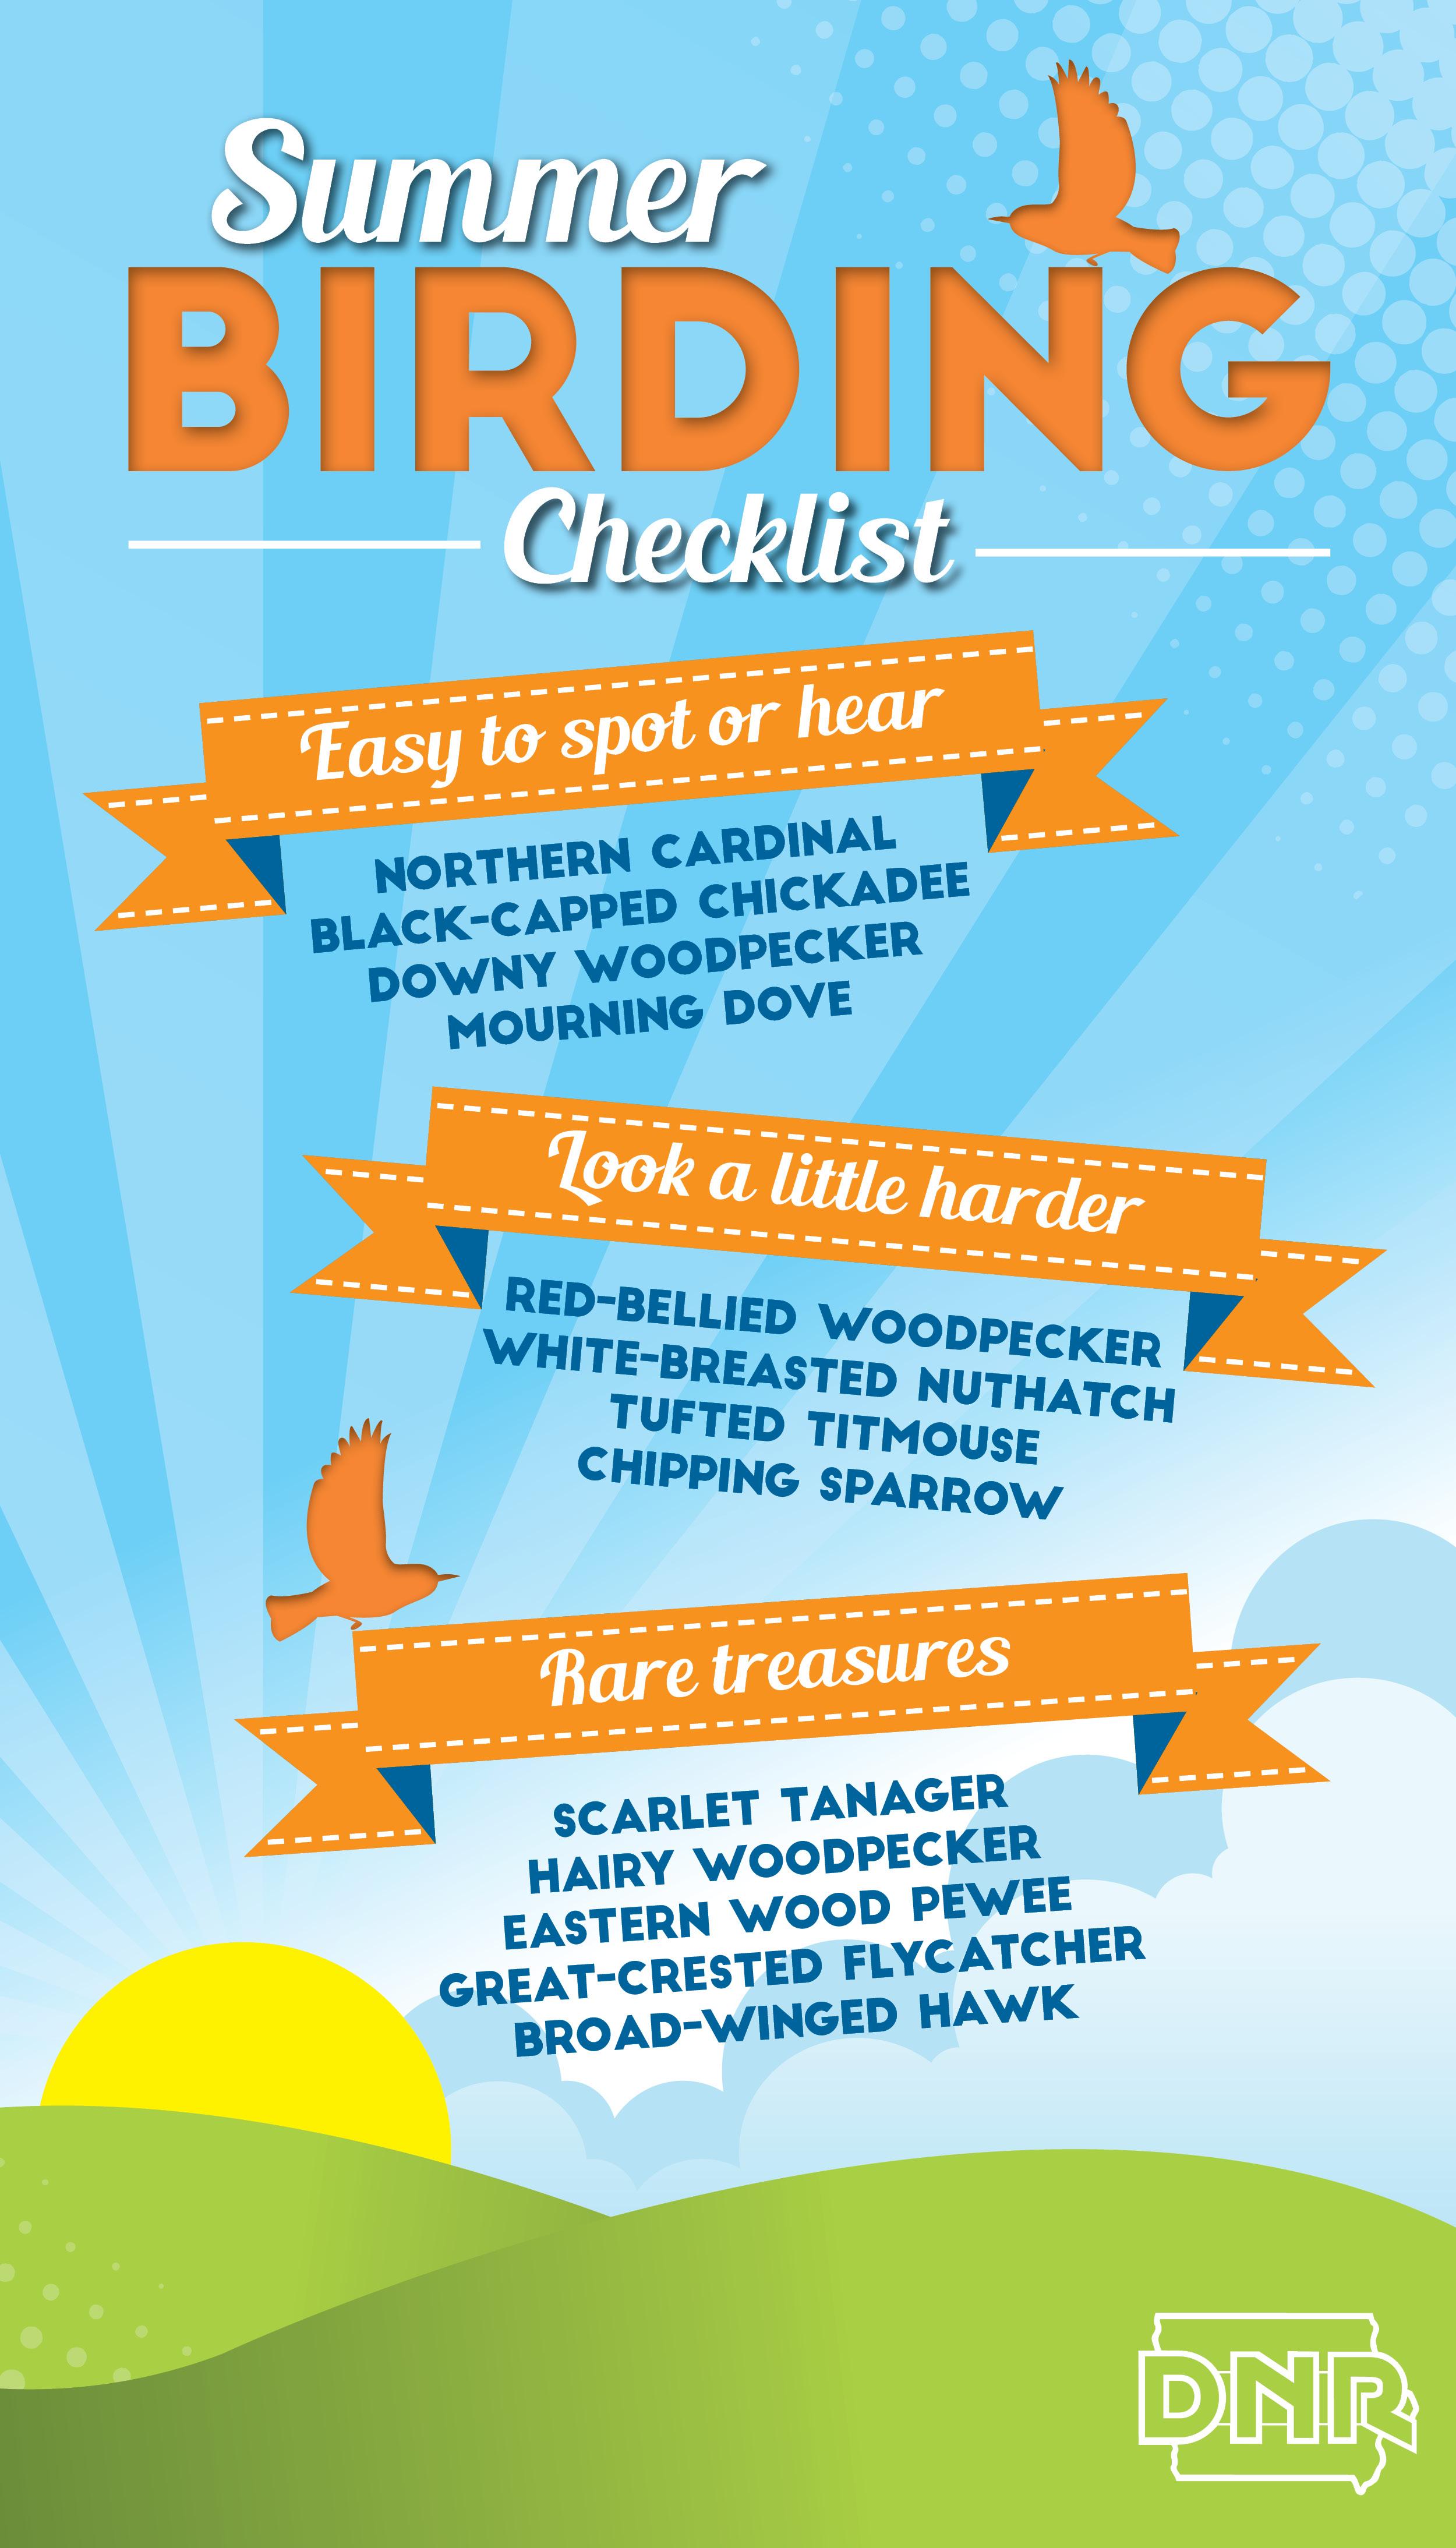 Summer birding checklist - how many can you spot? | Iowa DNR